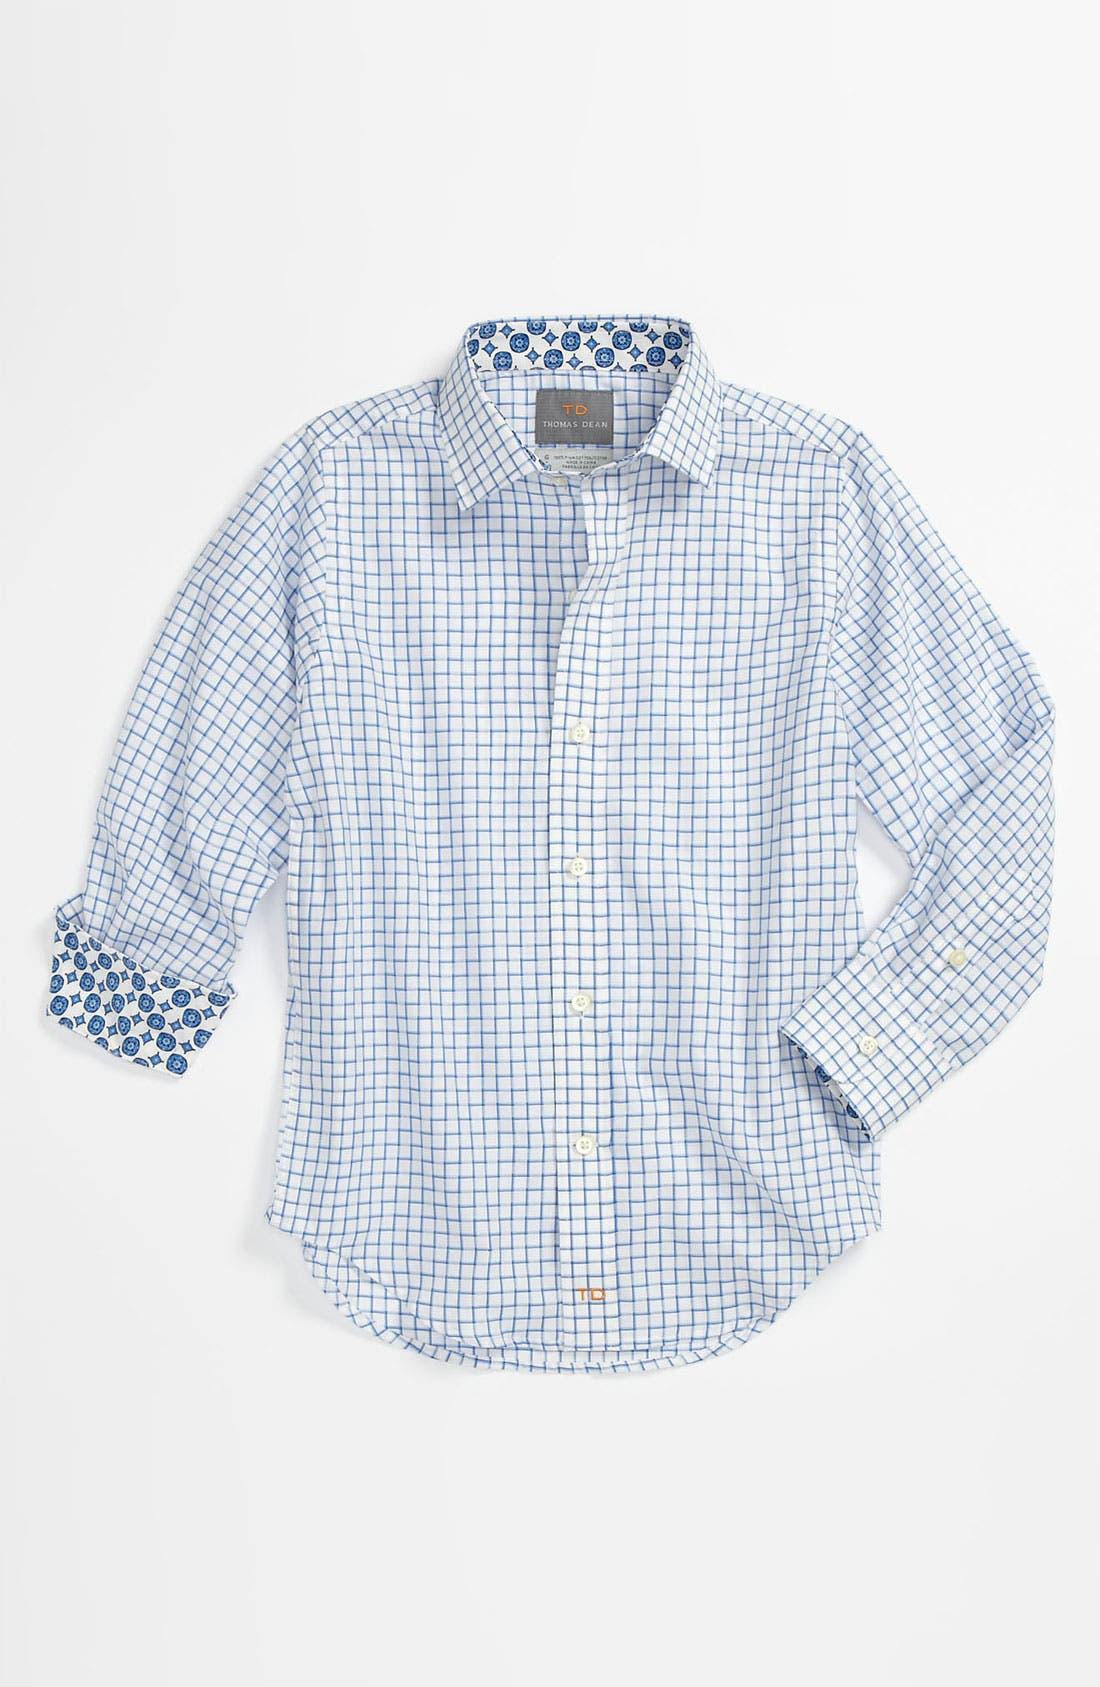 Alternate Image 1 Selected - Thomas Dean Dress Shirt (Little Boys)